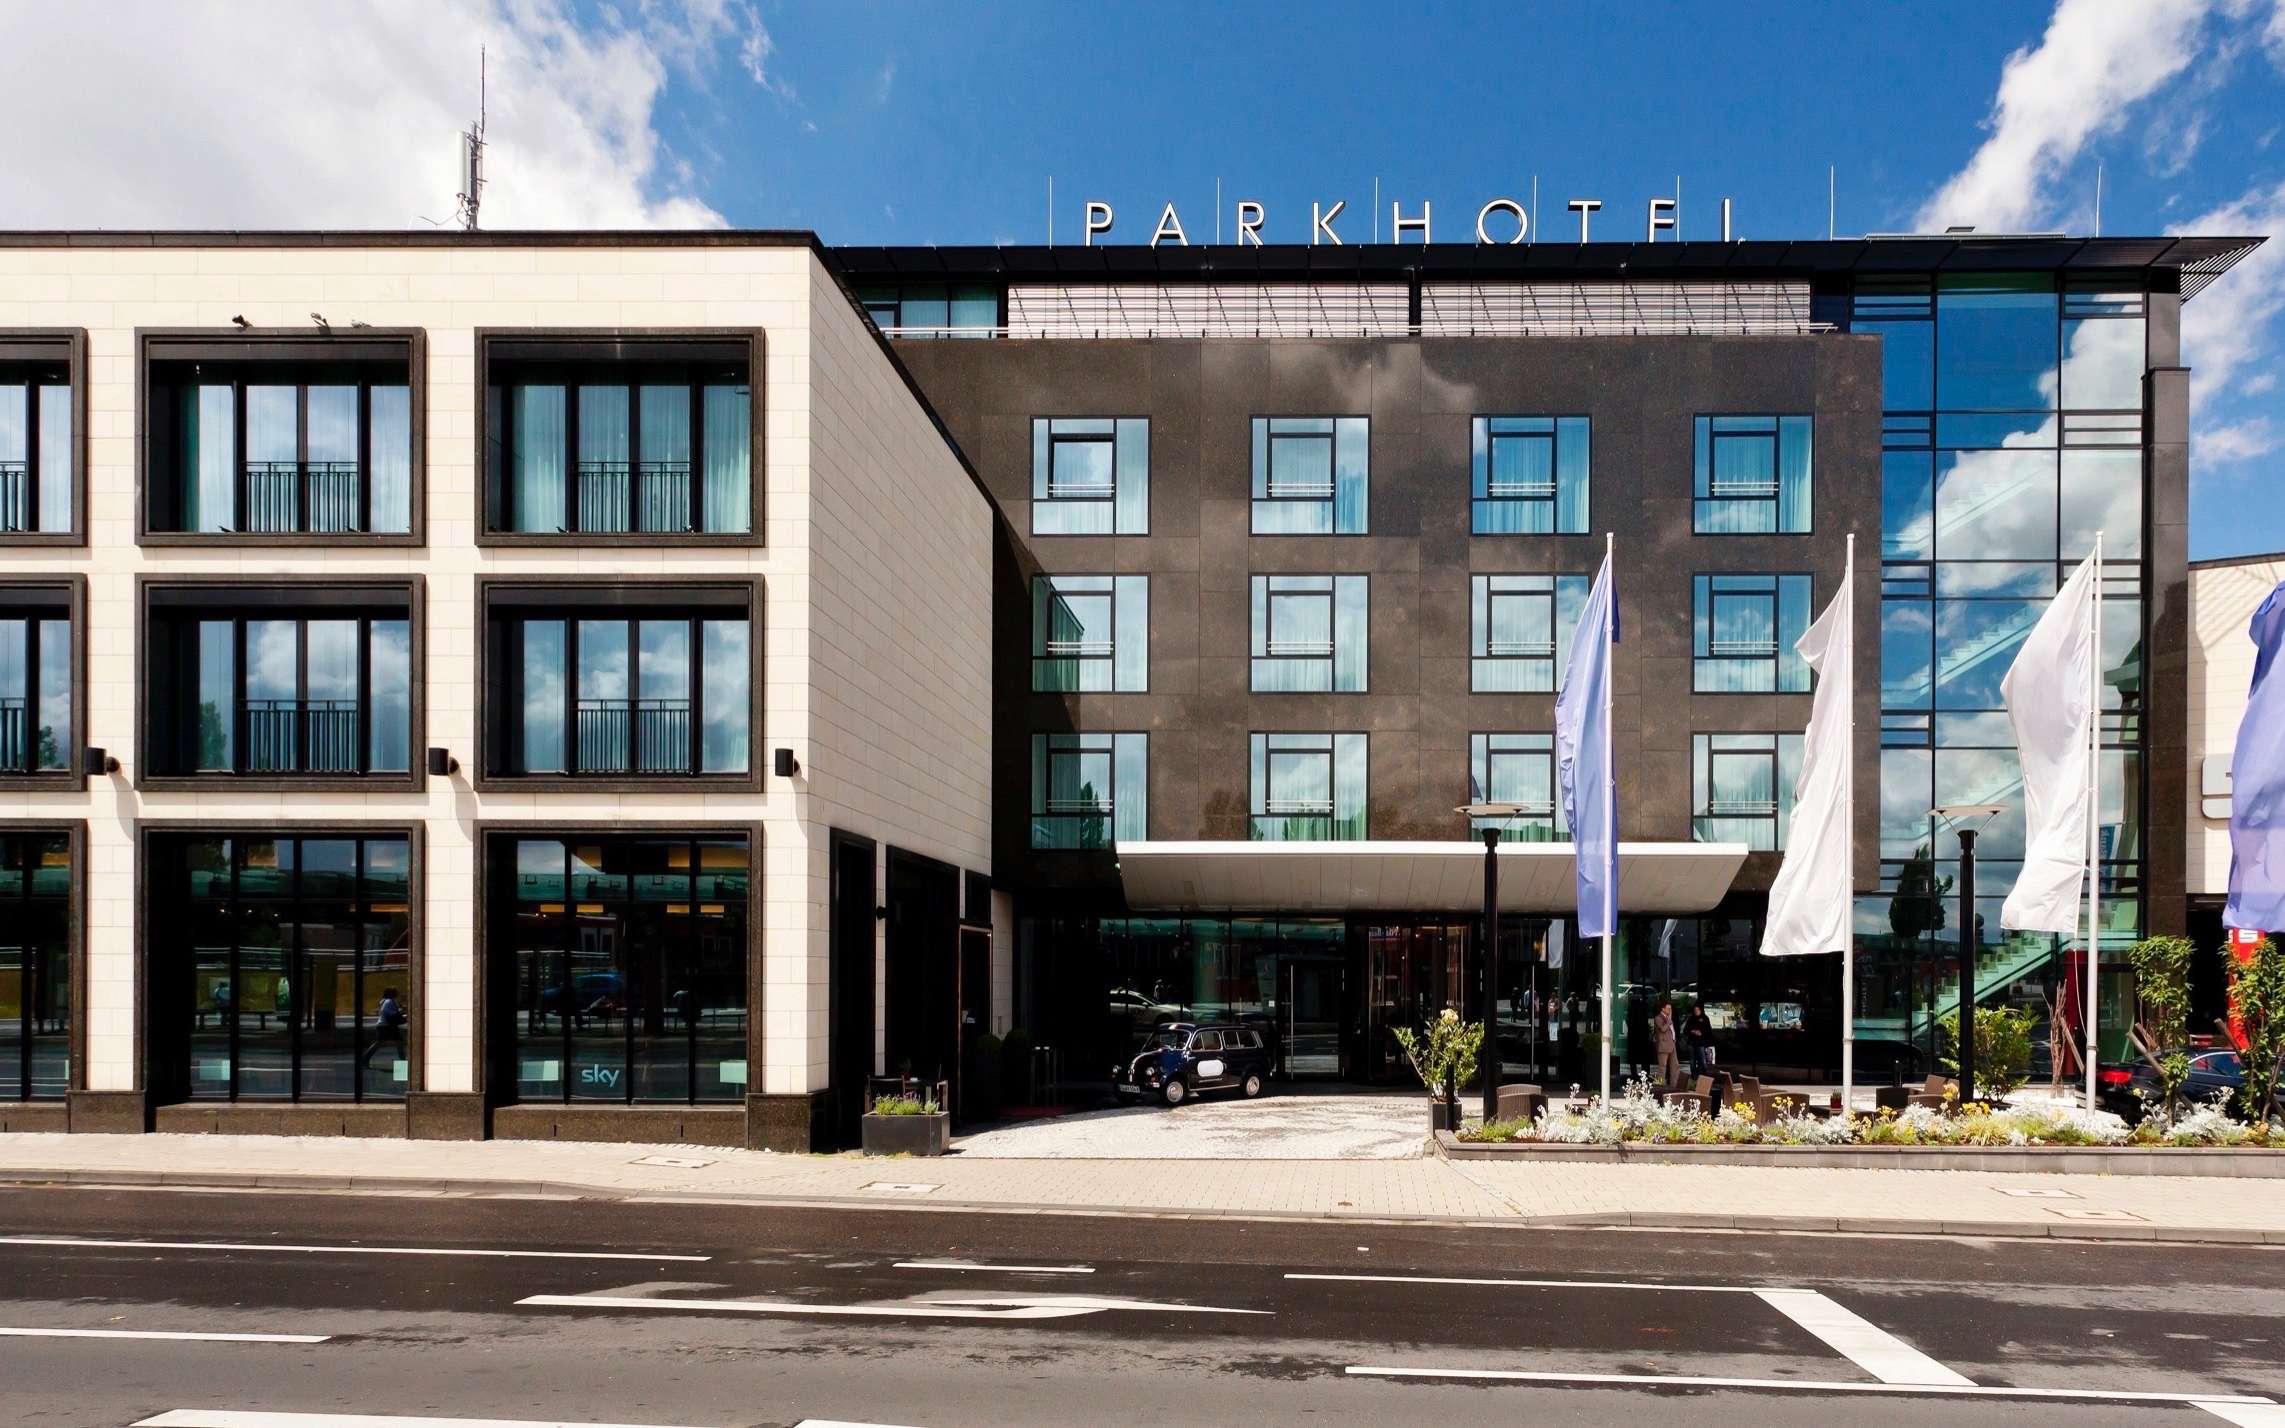 4 Sterne Parkhotel Welcome Hotel Euskirchen